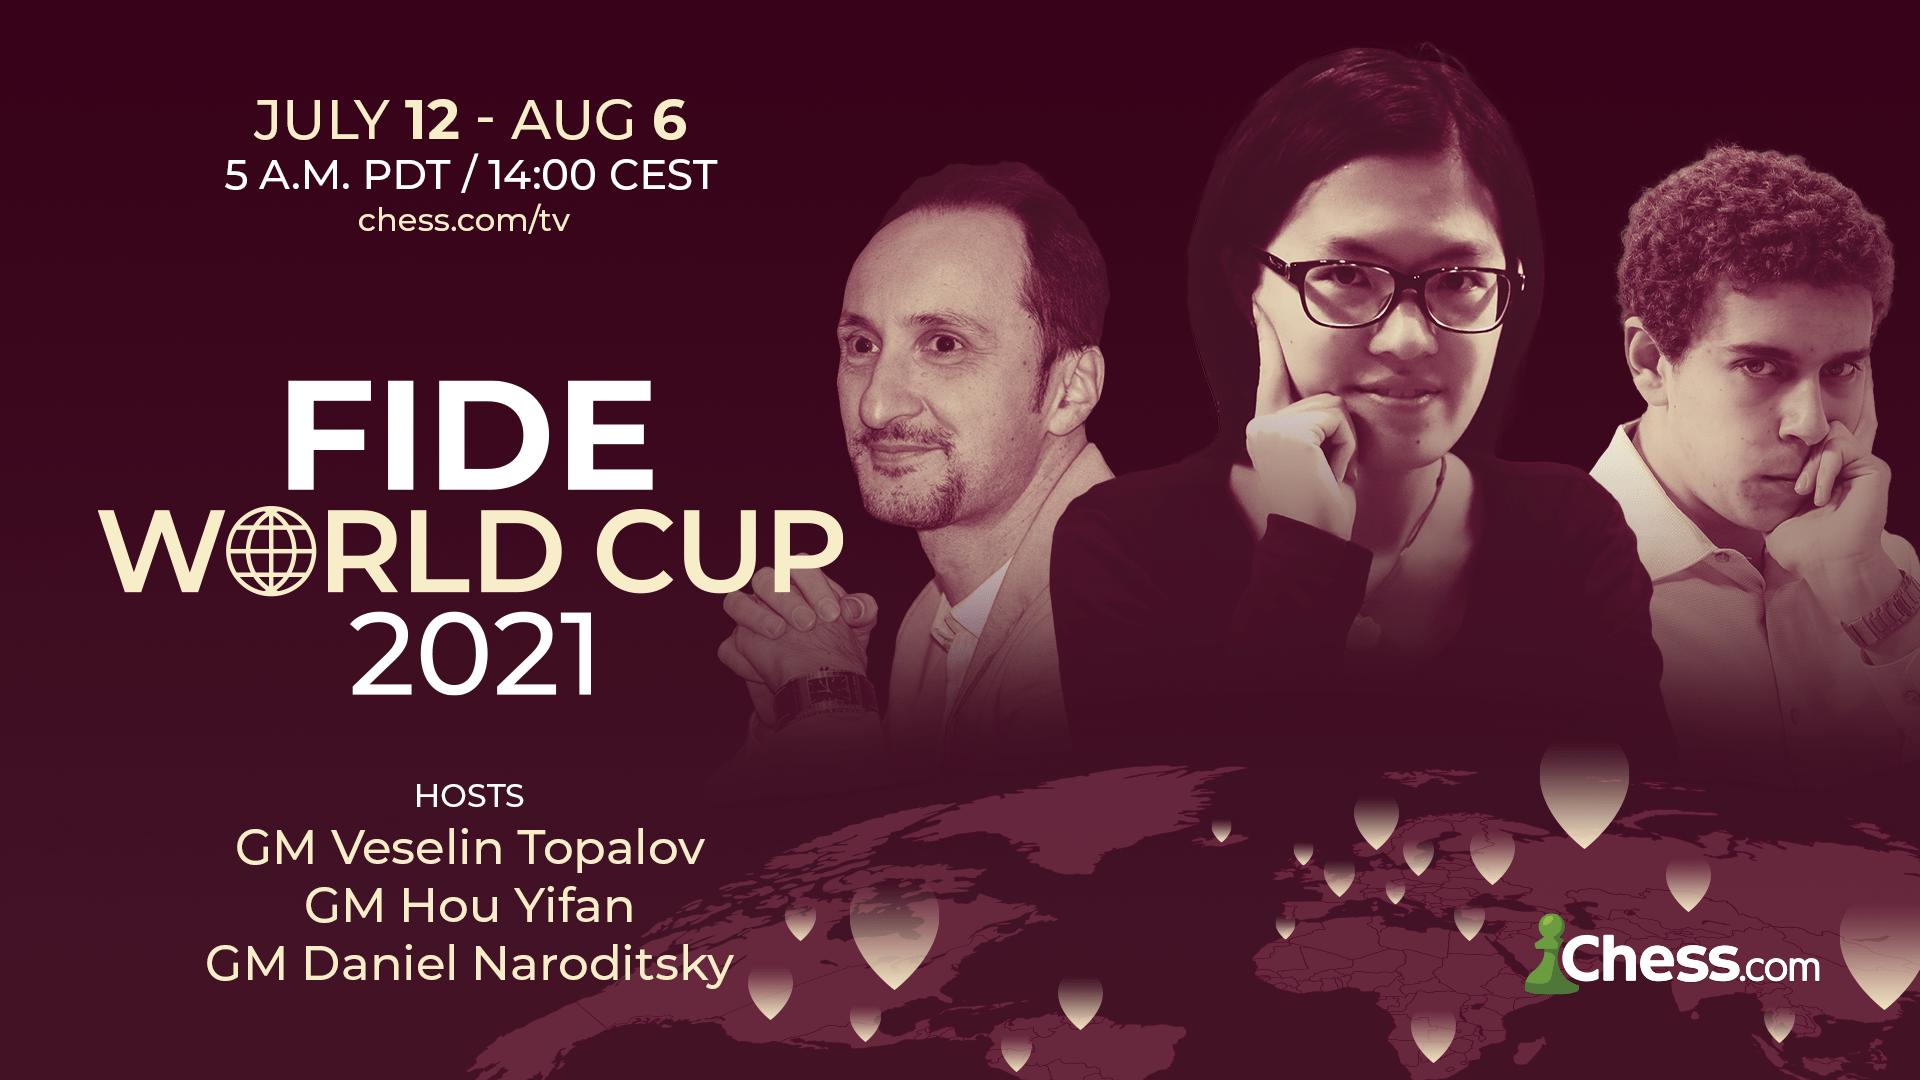 Chess.com broadcast FIDE World Cup